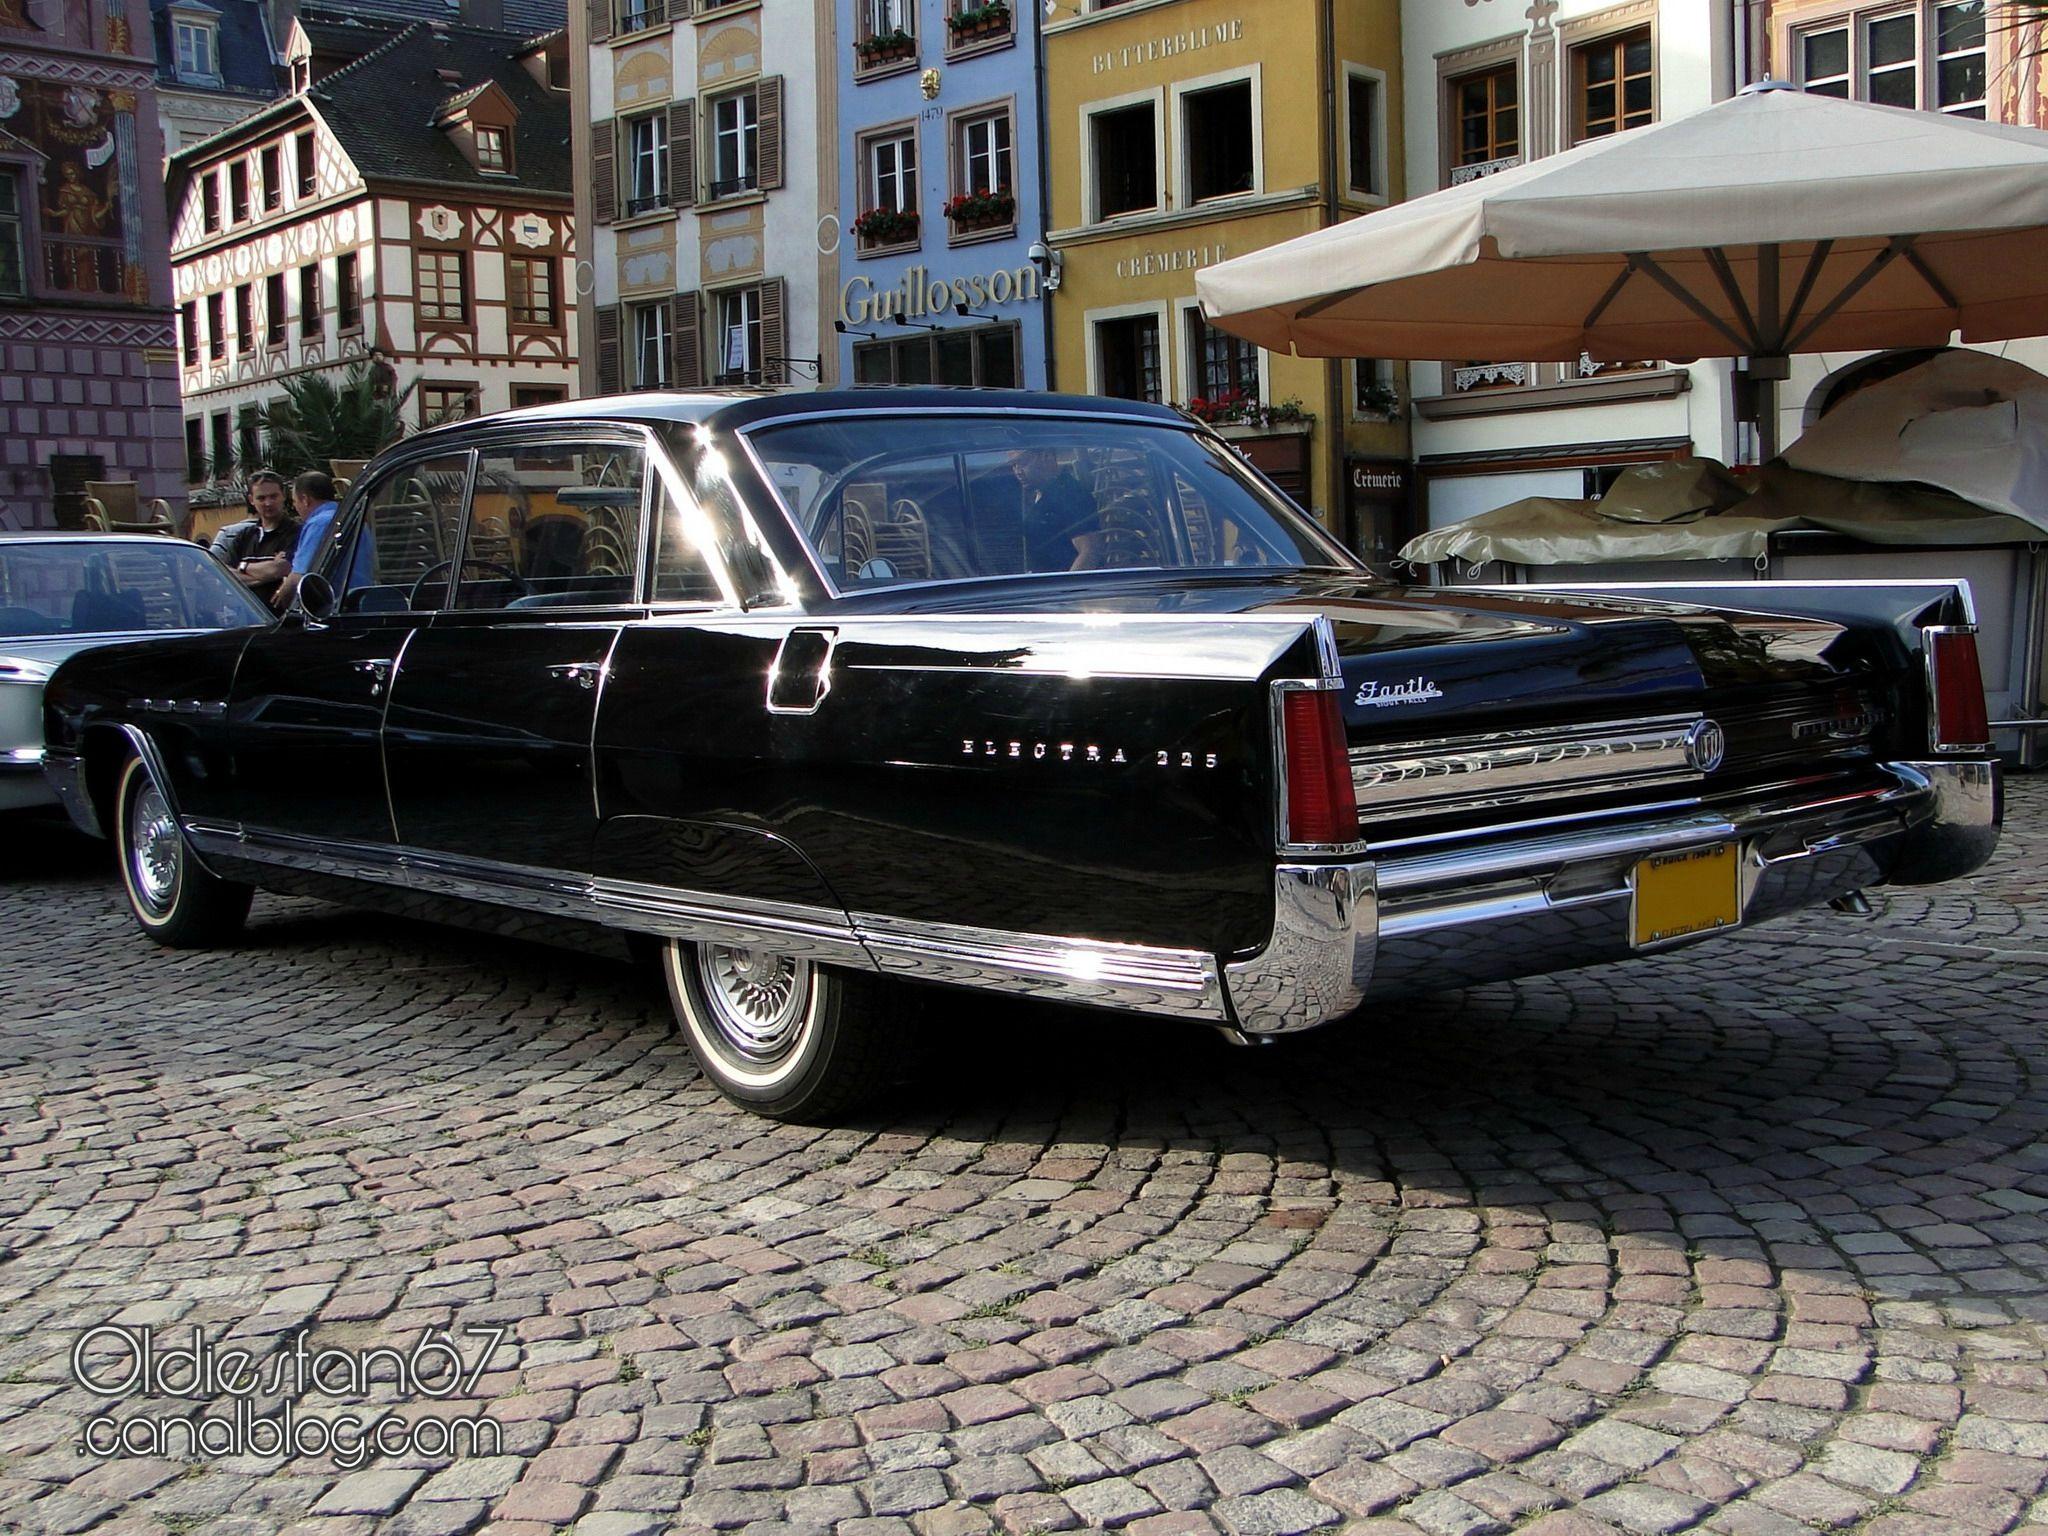 Buick electra 225 sedan 1964 02 buick pinterest electra 225 buick electra and buick